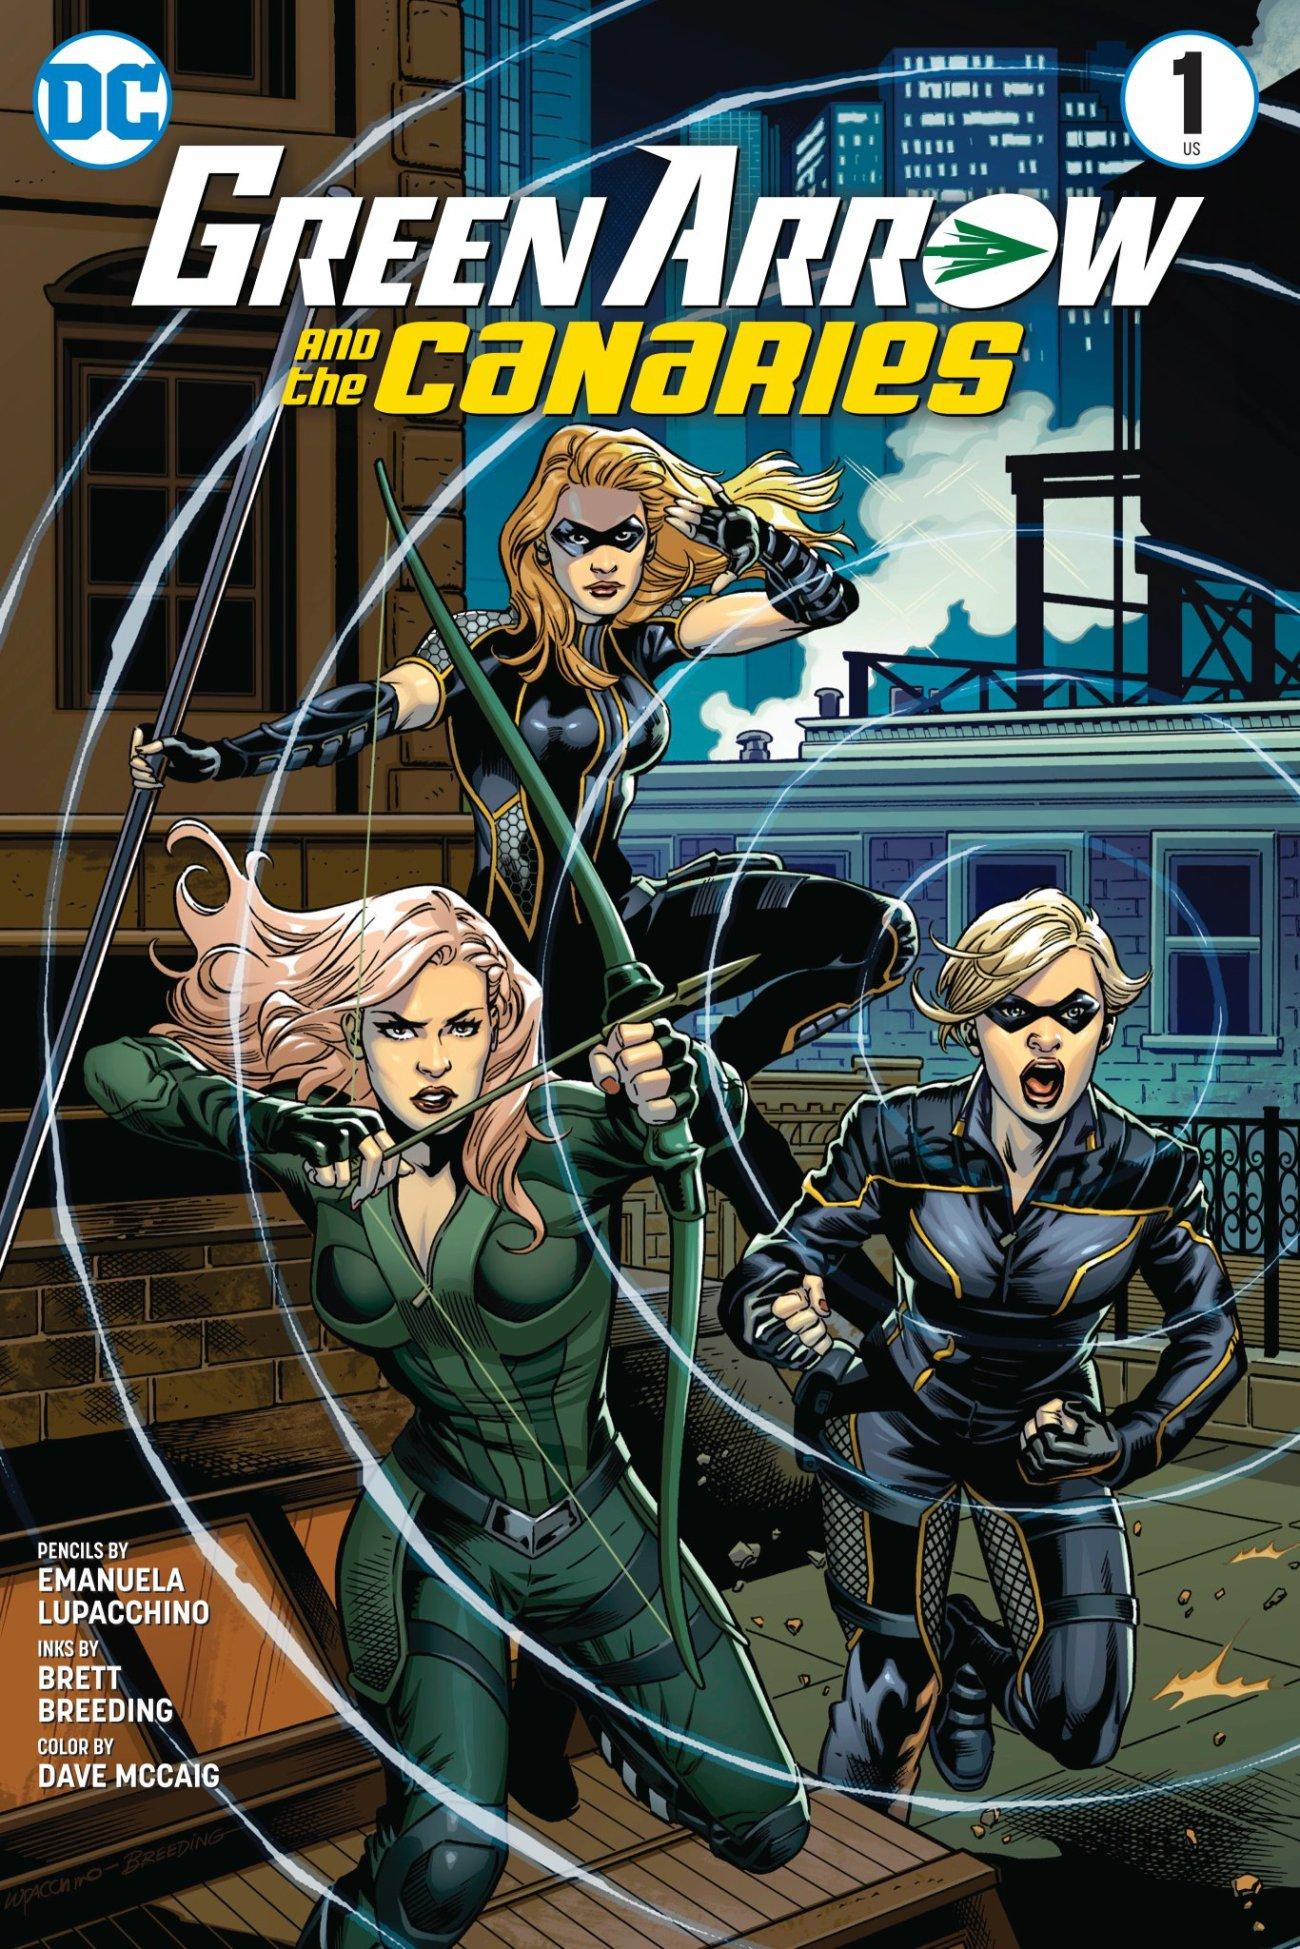 Arte promocional de Green Arrow and the Canaries. Imagen: Marc Guggenheim Twitter (@mguggenheim).